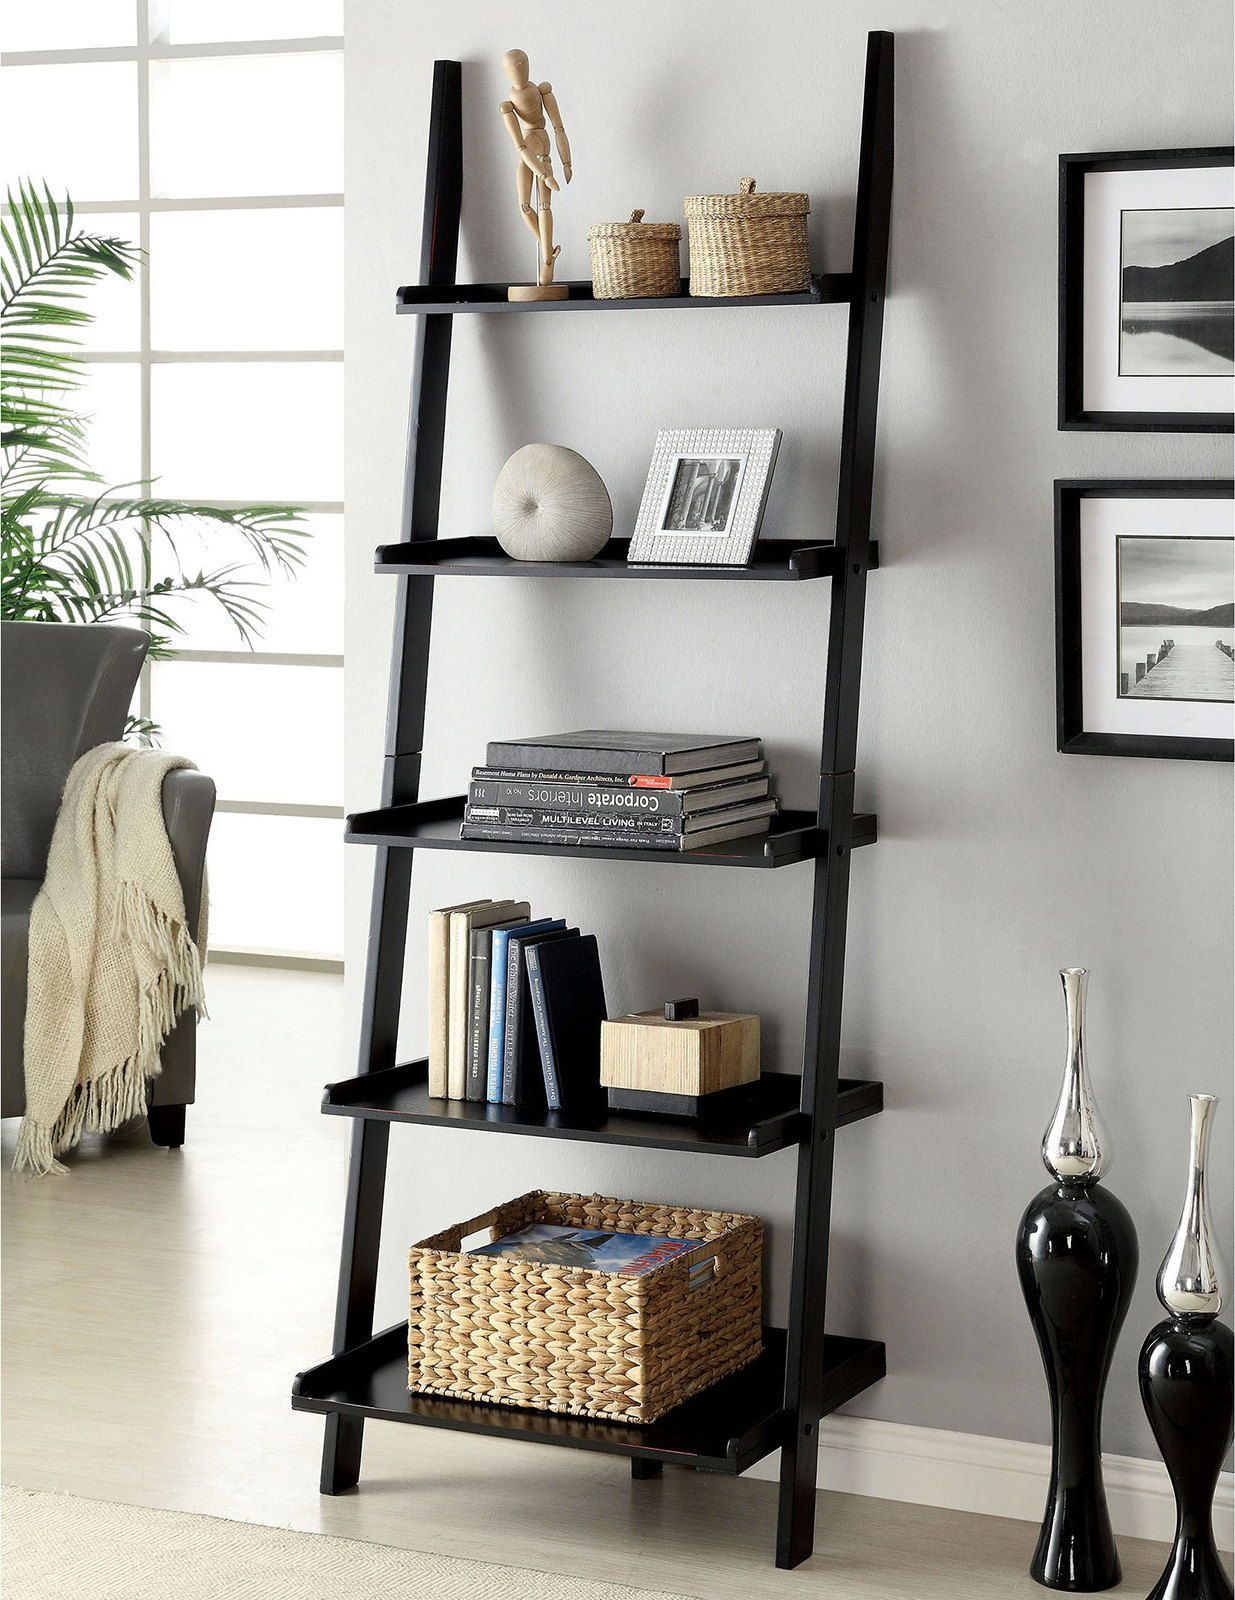 Sion Ladder Shelf Blackblack In 2021 Ladder Shelf Decor Home Decor Leaning Bookcase Bedroom decor ladder shelf